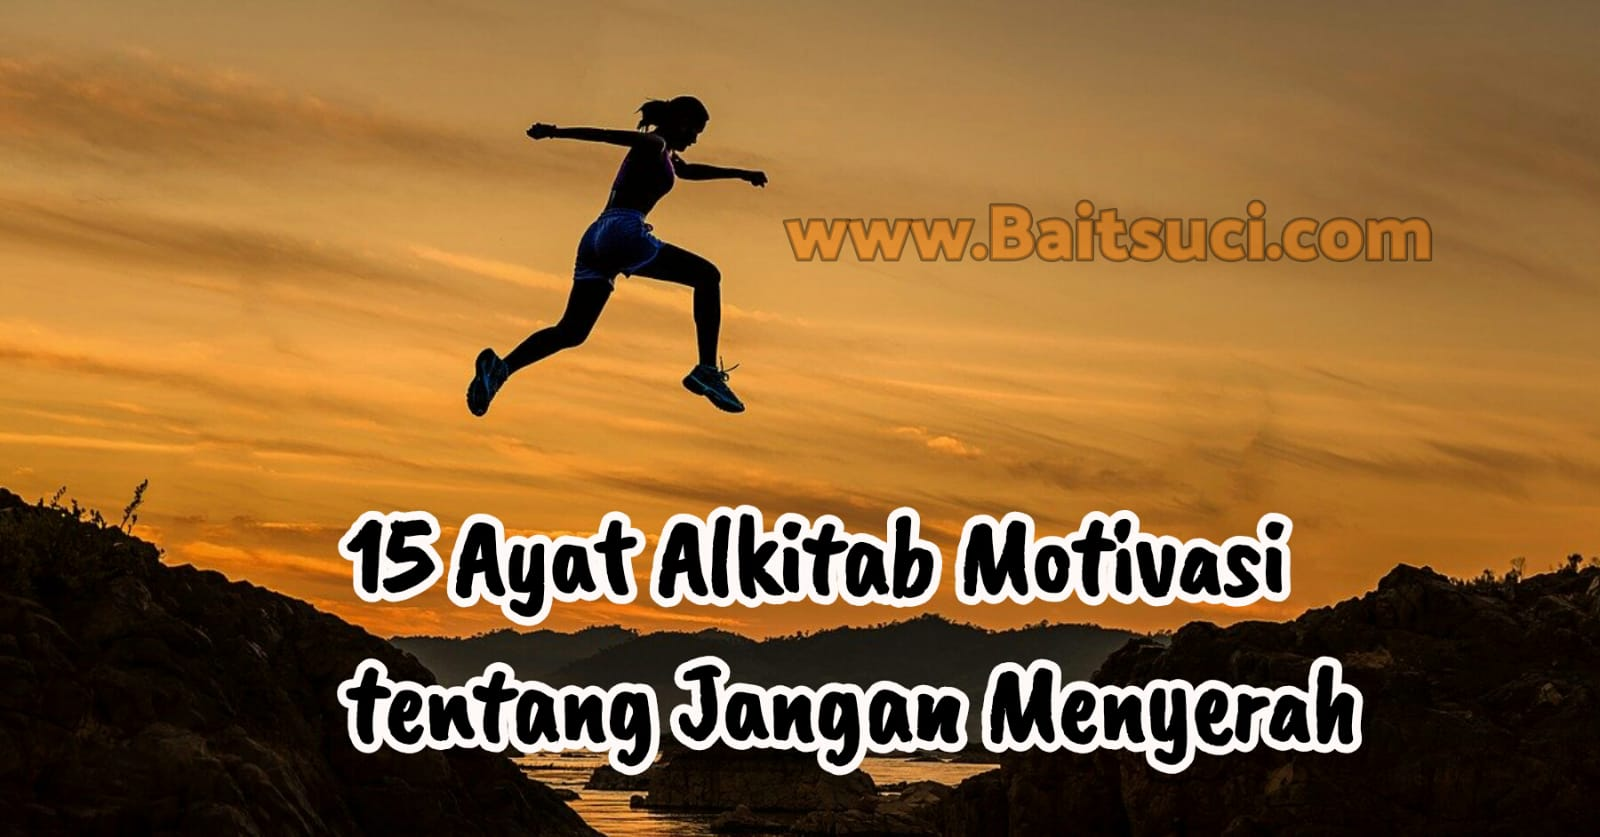 15 Ayat Alkitab Motivasi Tentang Jangan Menyerah